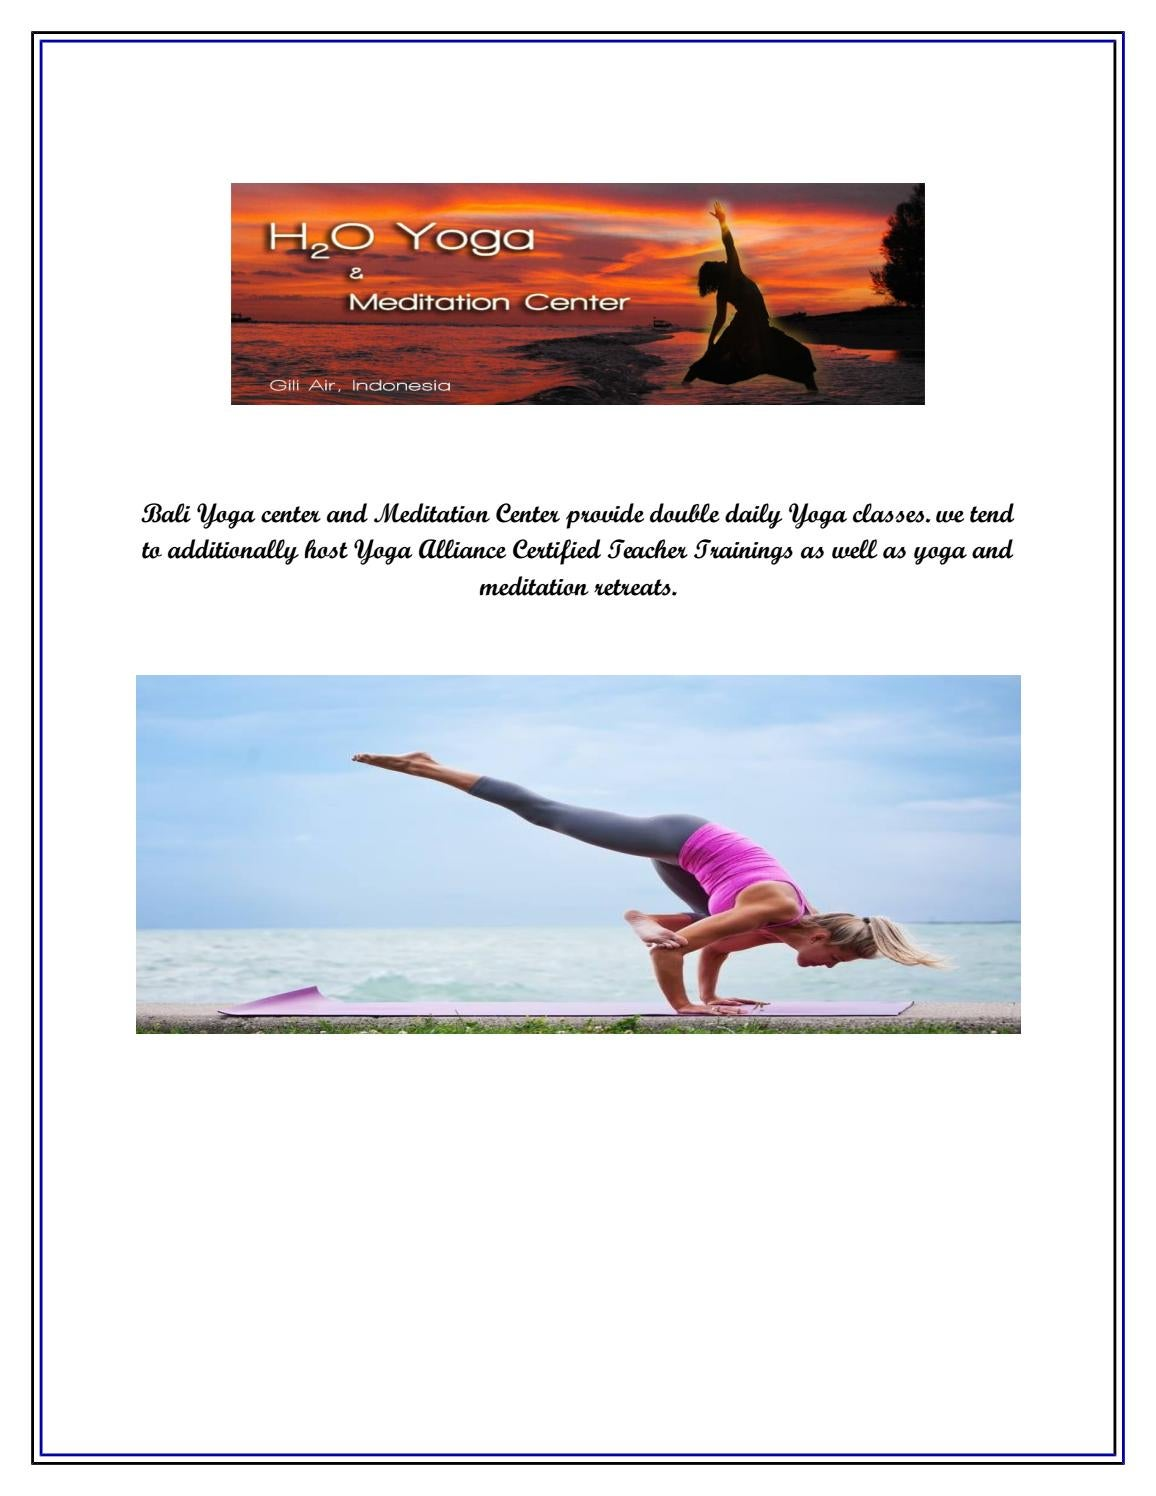 Bali Yoga Retreat H2o Yoga And Meditation Center Indonesia By H2o Yoga Meditation Center Issuu